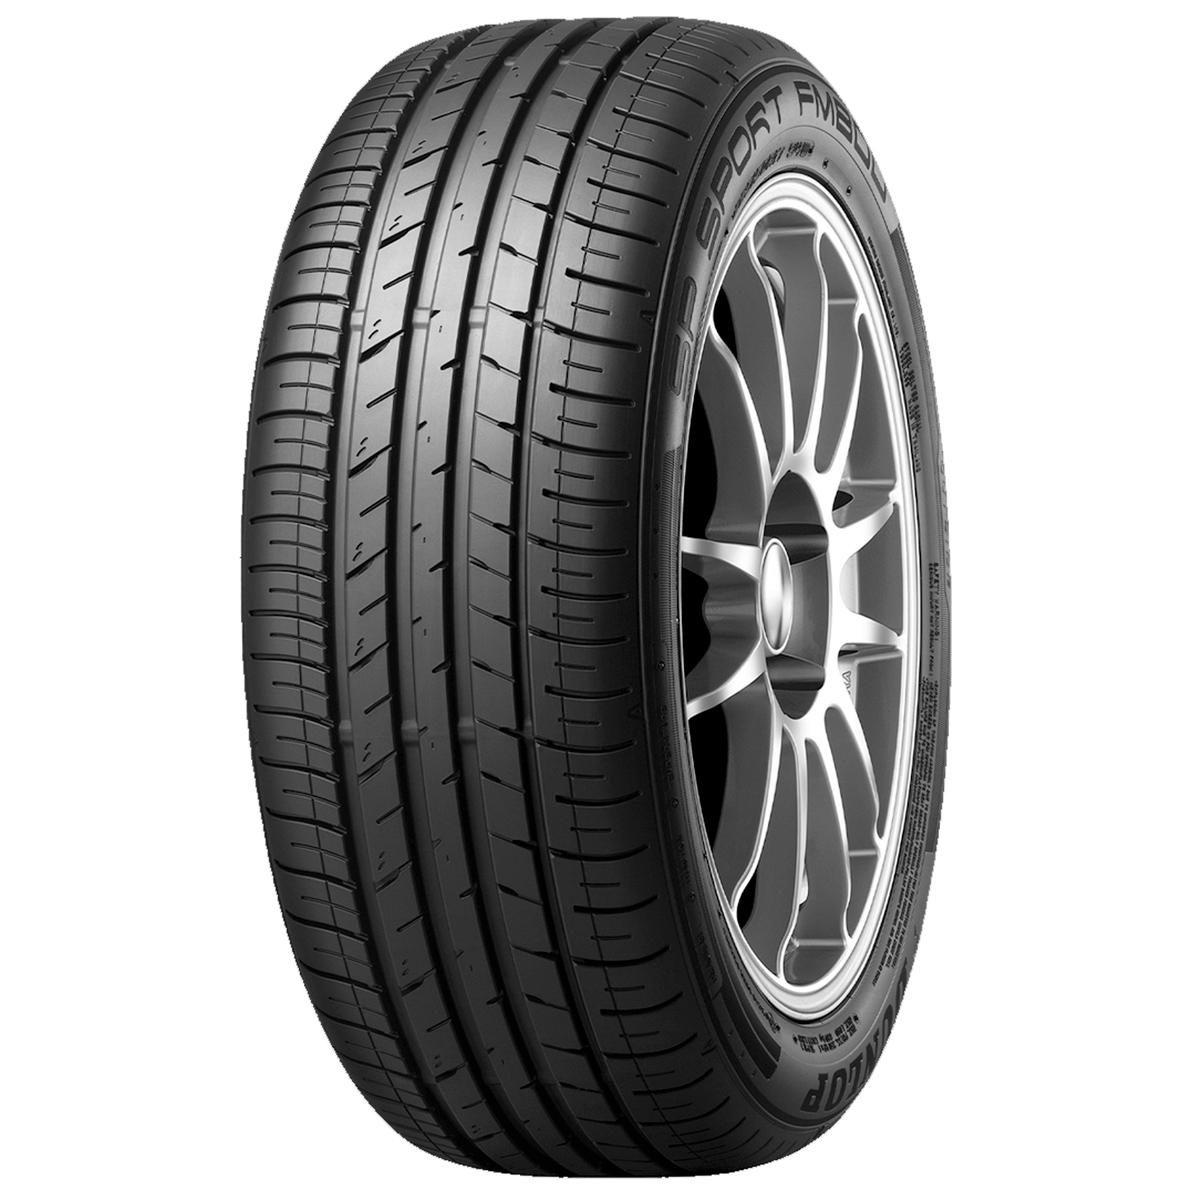 Pneu Dunlop 195/55R15 85V SPMF800